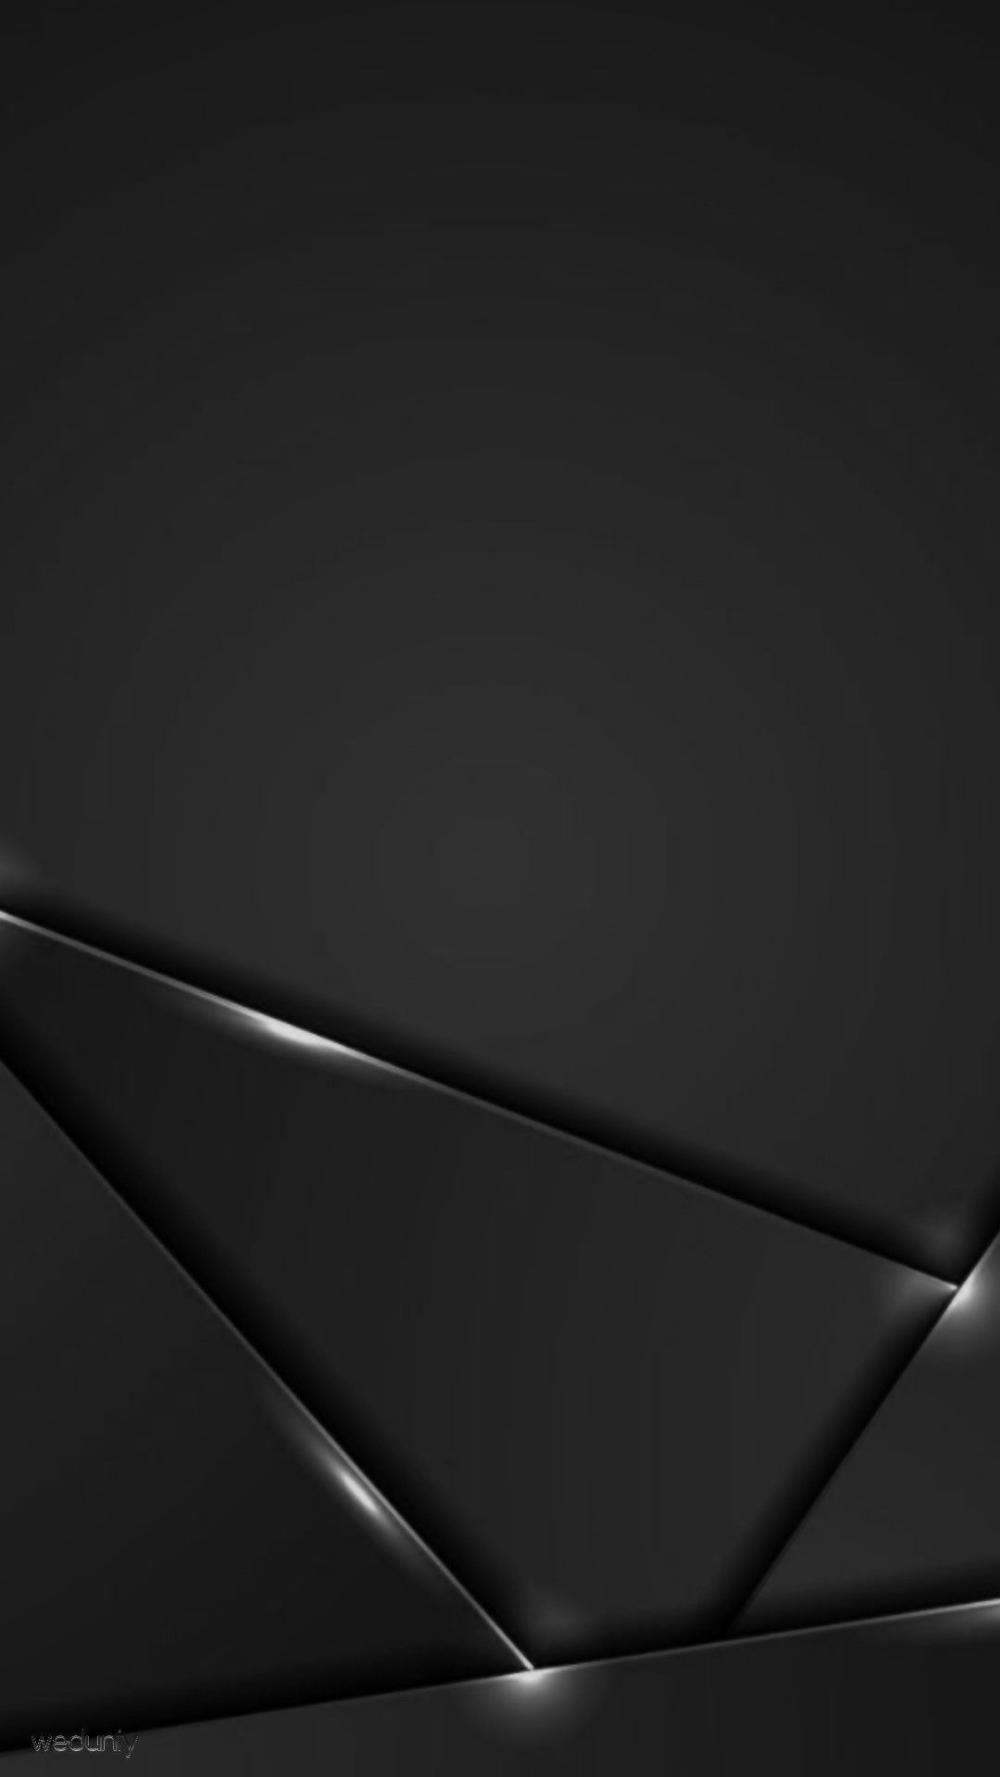 Download 52 Best 3d Dark Wallpapers For Mobile In 2020 Dark Wallpaper Backgrounds Phone Wallpapers Wallpaper